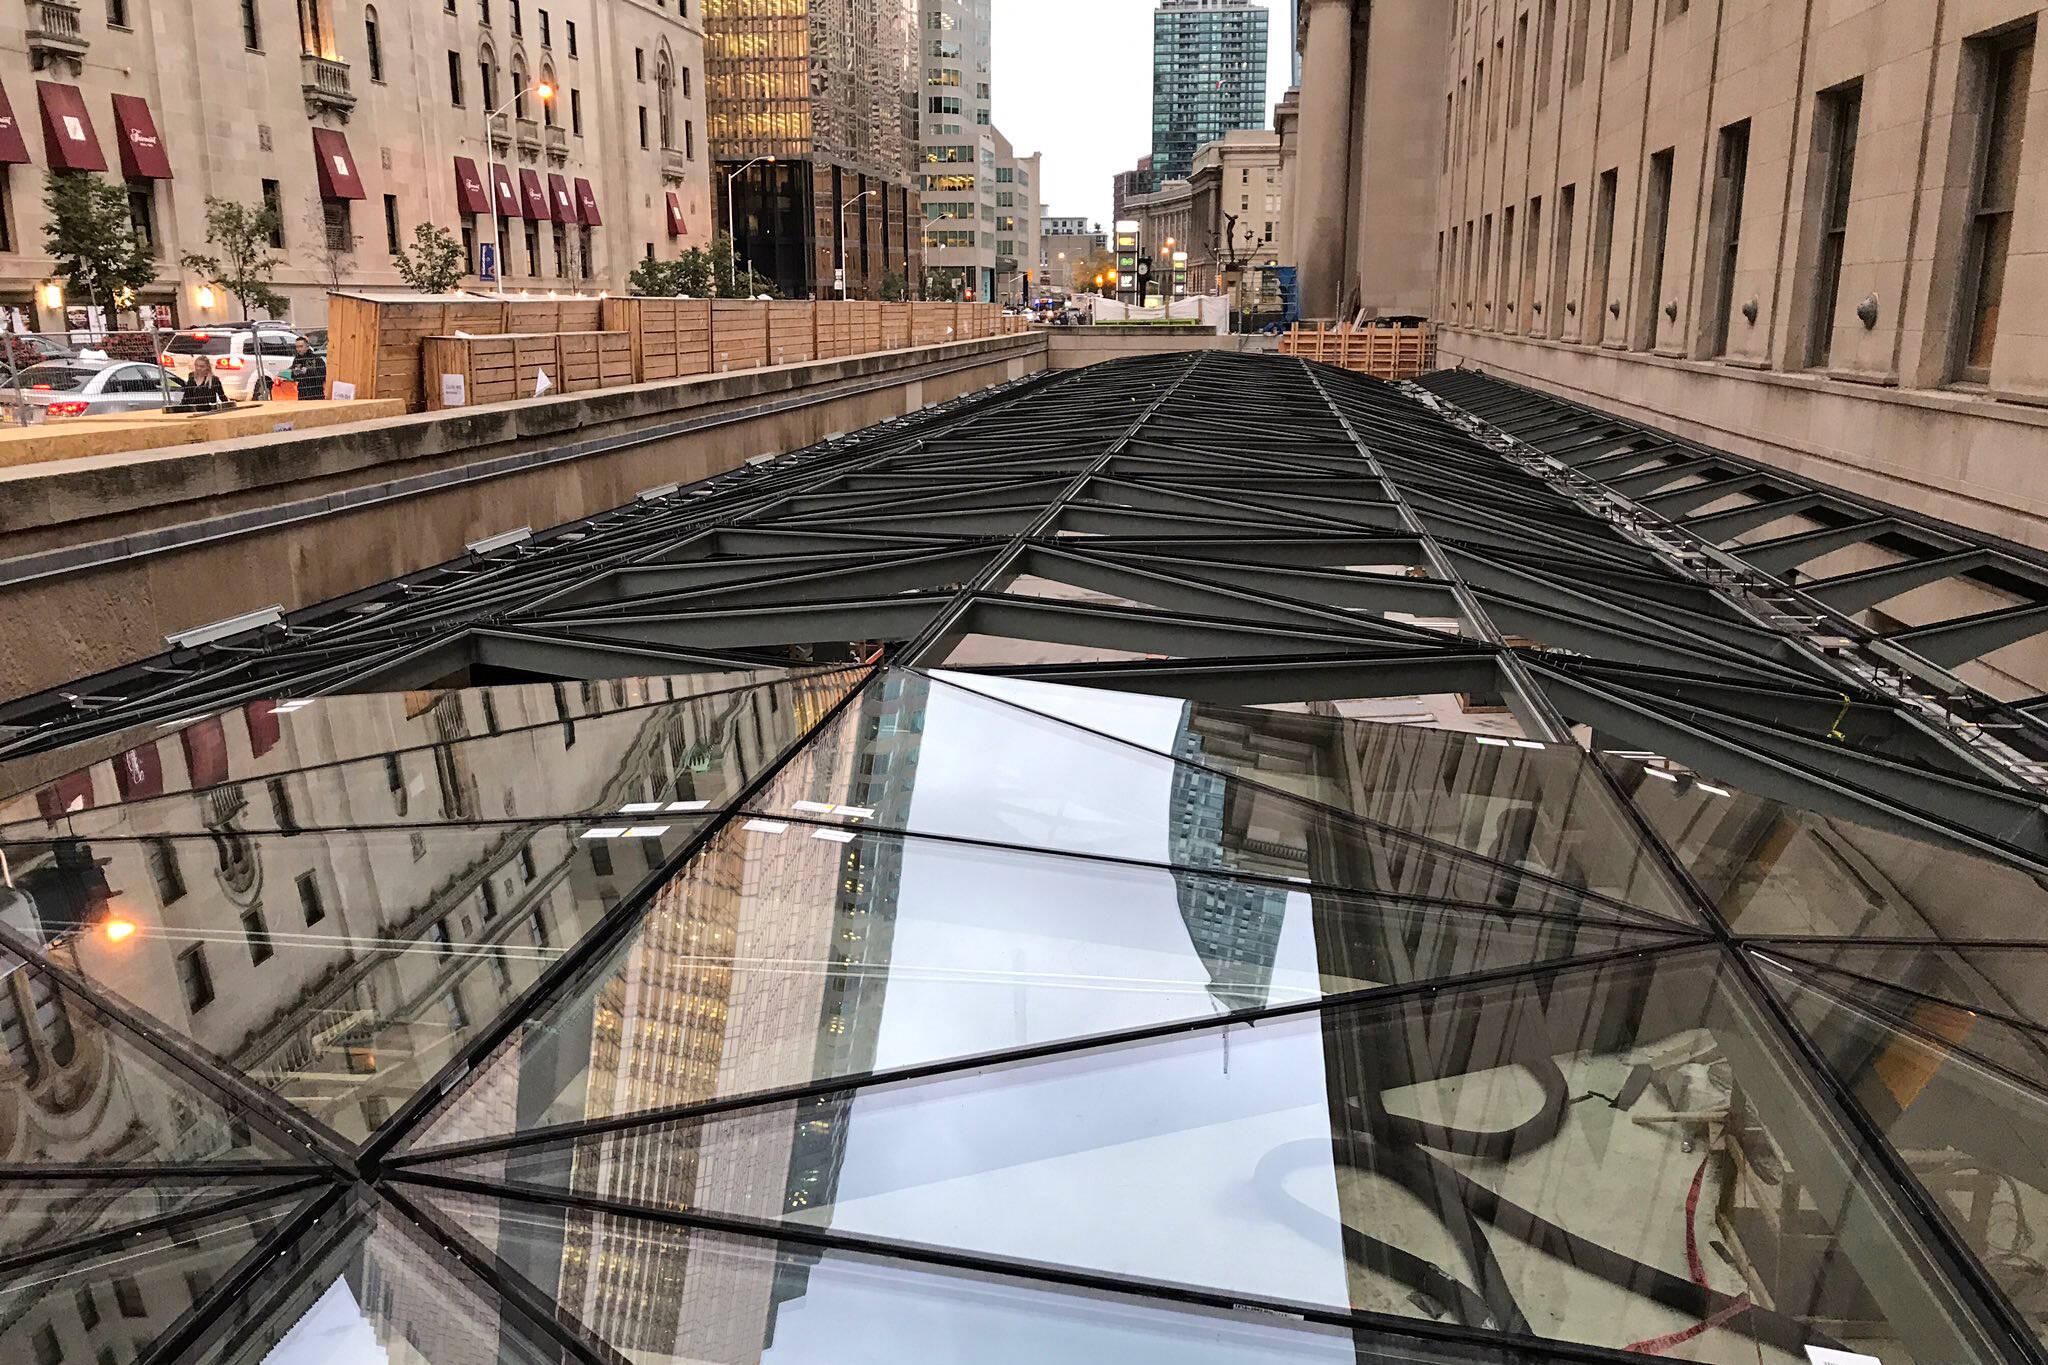 union station glass moat